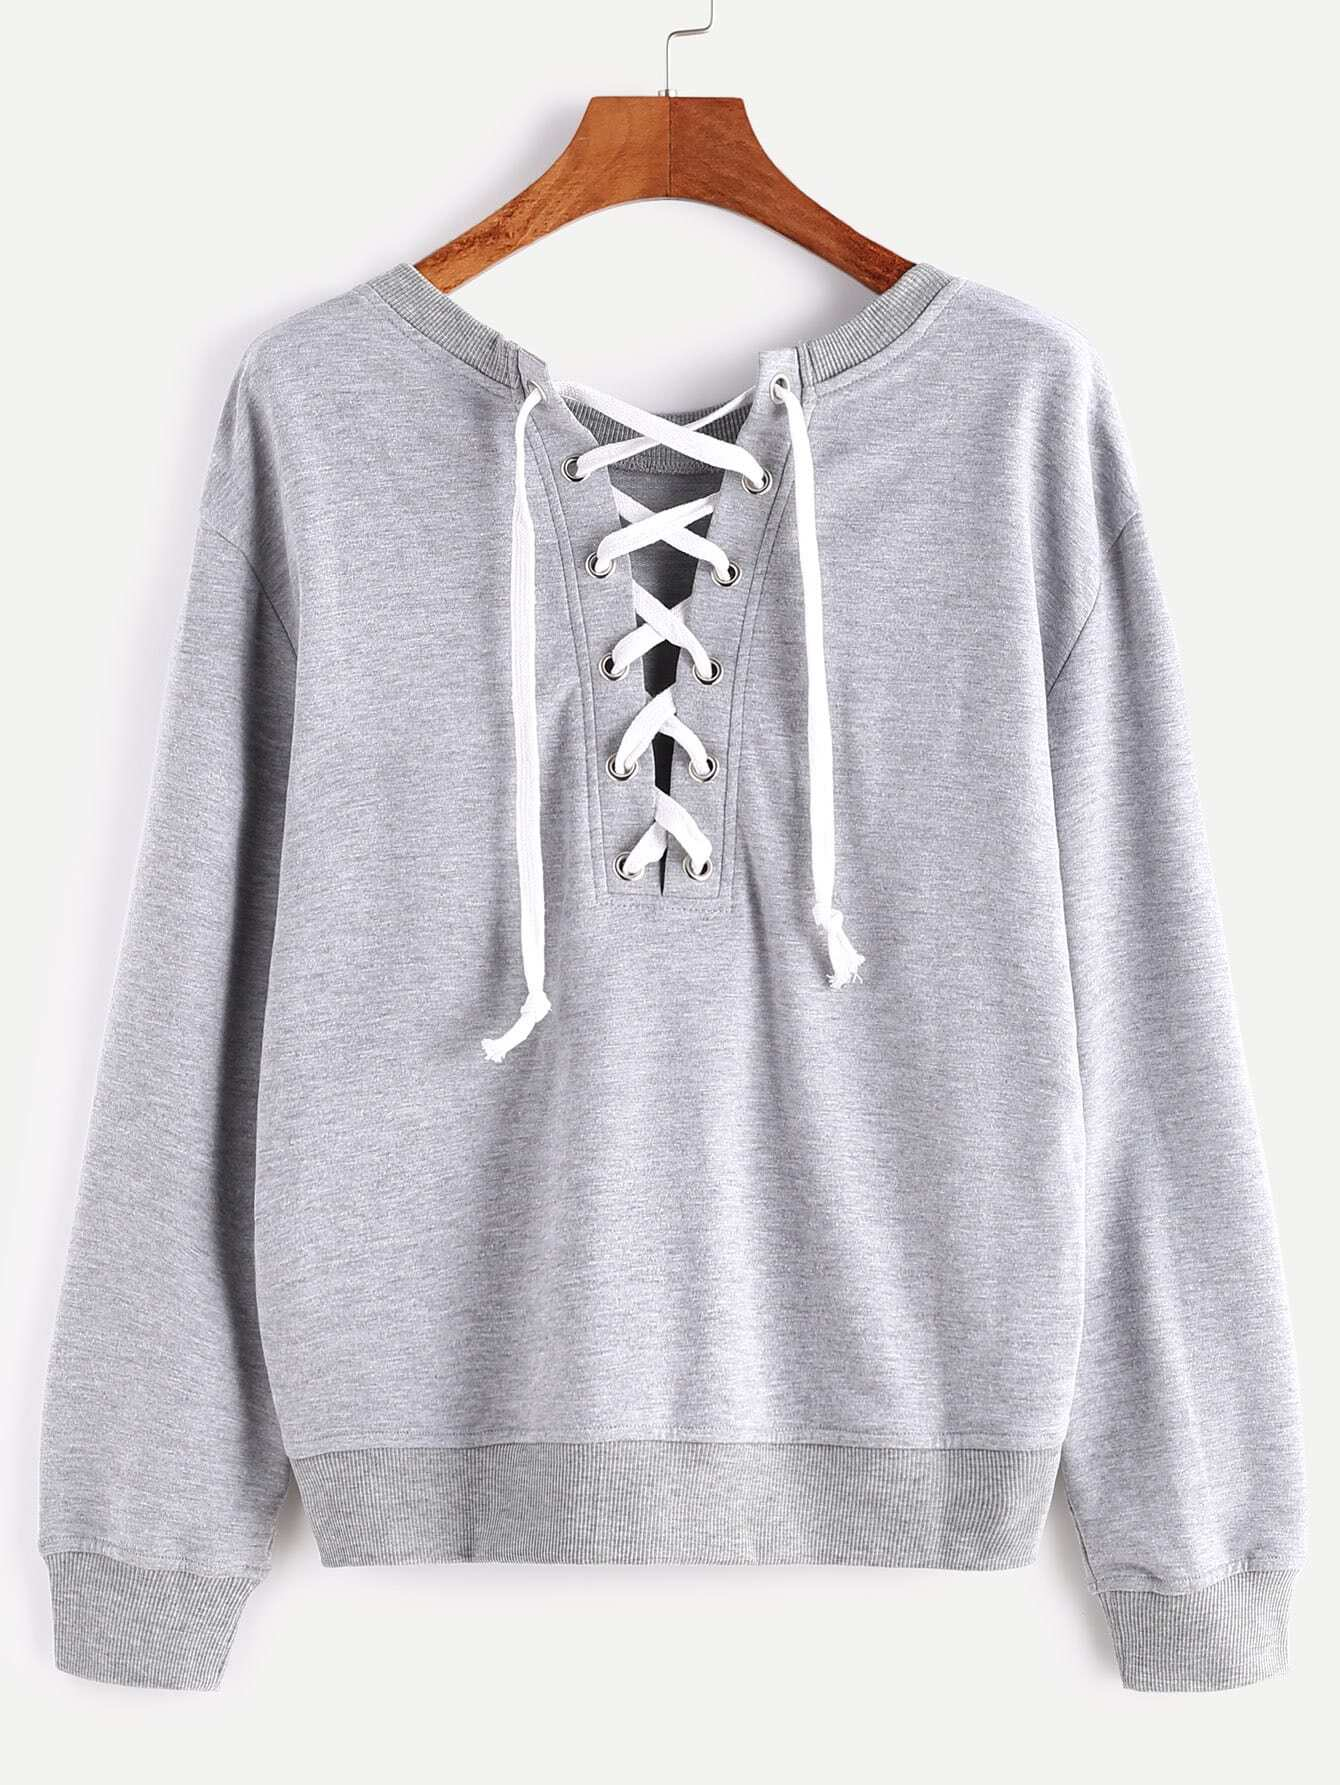 Heather Grey Lace Up Back SweatshirtHeather Grey Lace Up Back Sweatshirt<br><br>color: Grey<br>size: M,S,XS